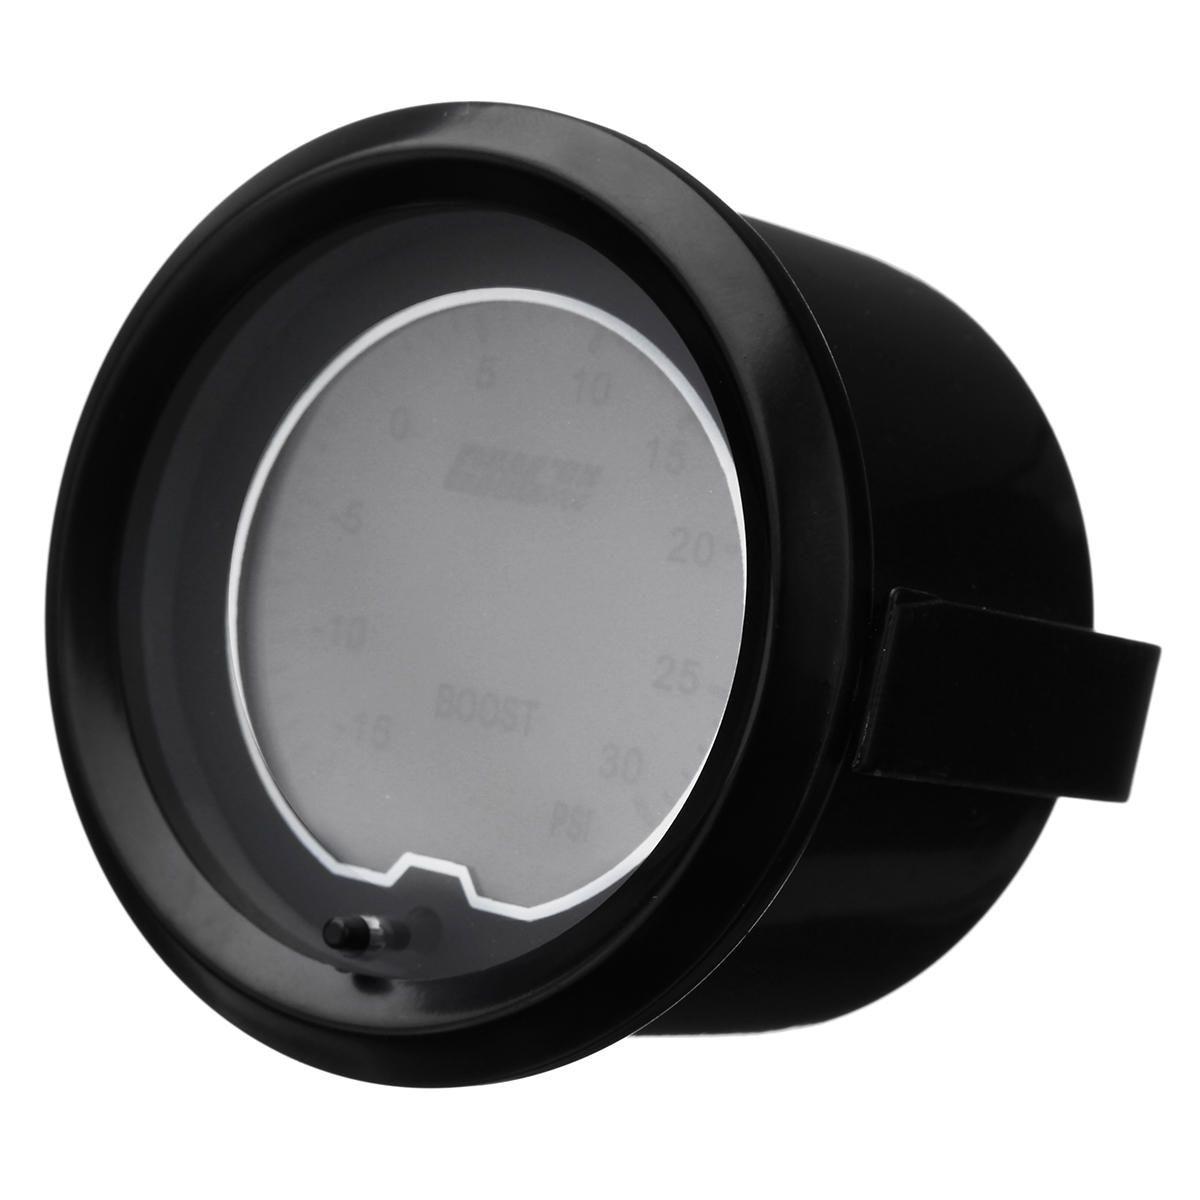 QDQ US$26.31 Universal 2 Inch 52mm PSI Turbo Boost Gauge Digital LED Light Display Car Meter